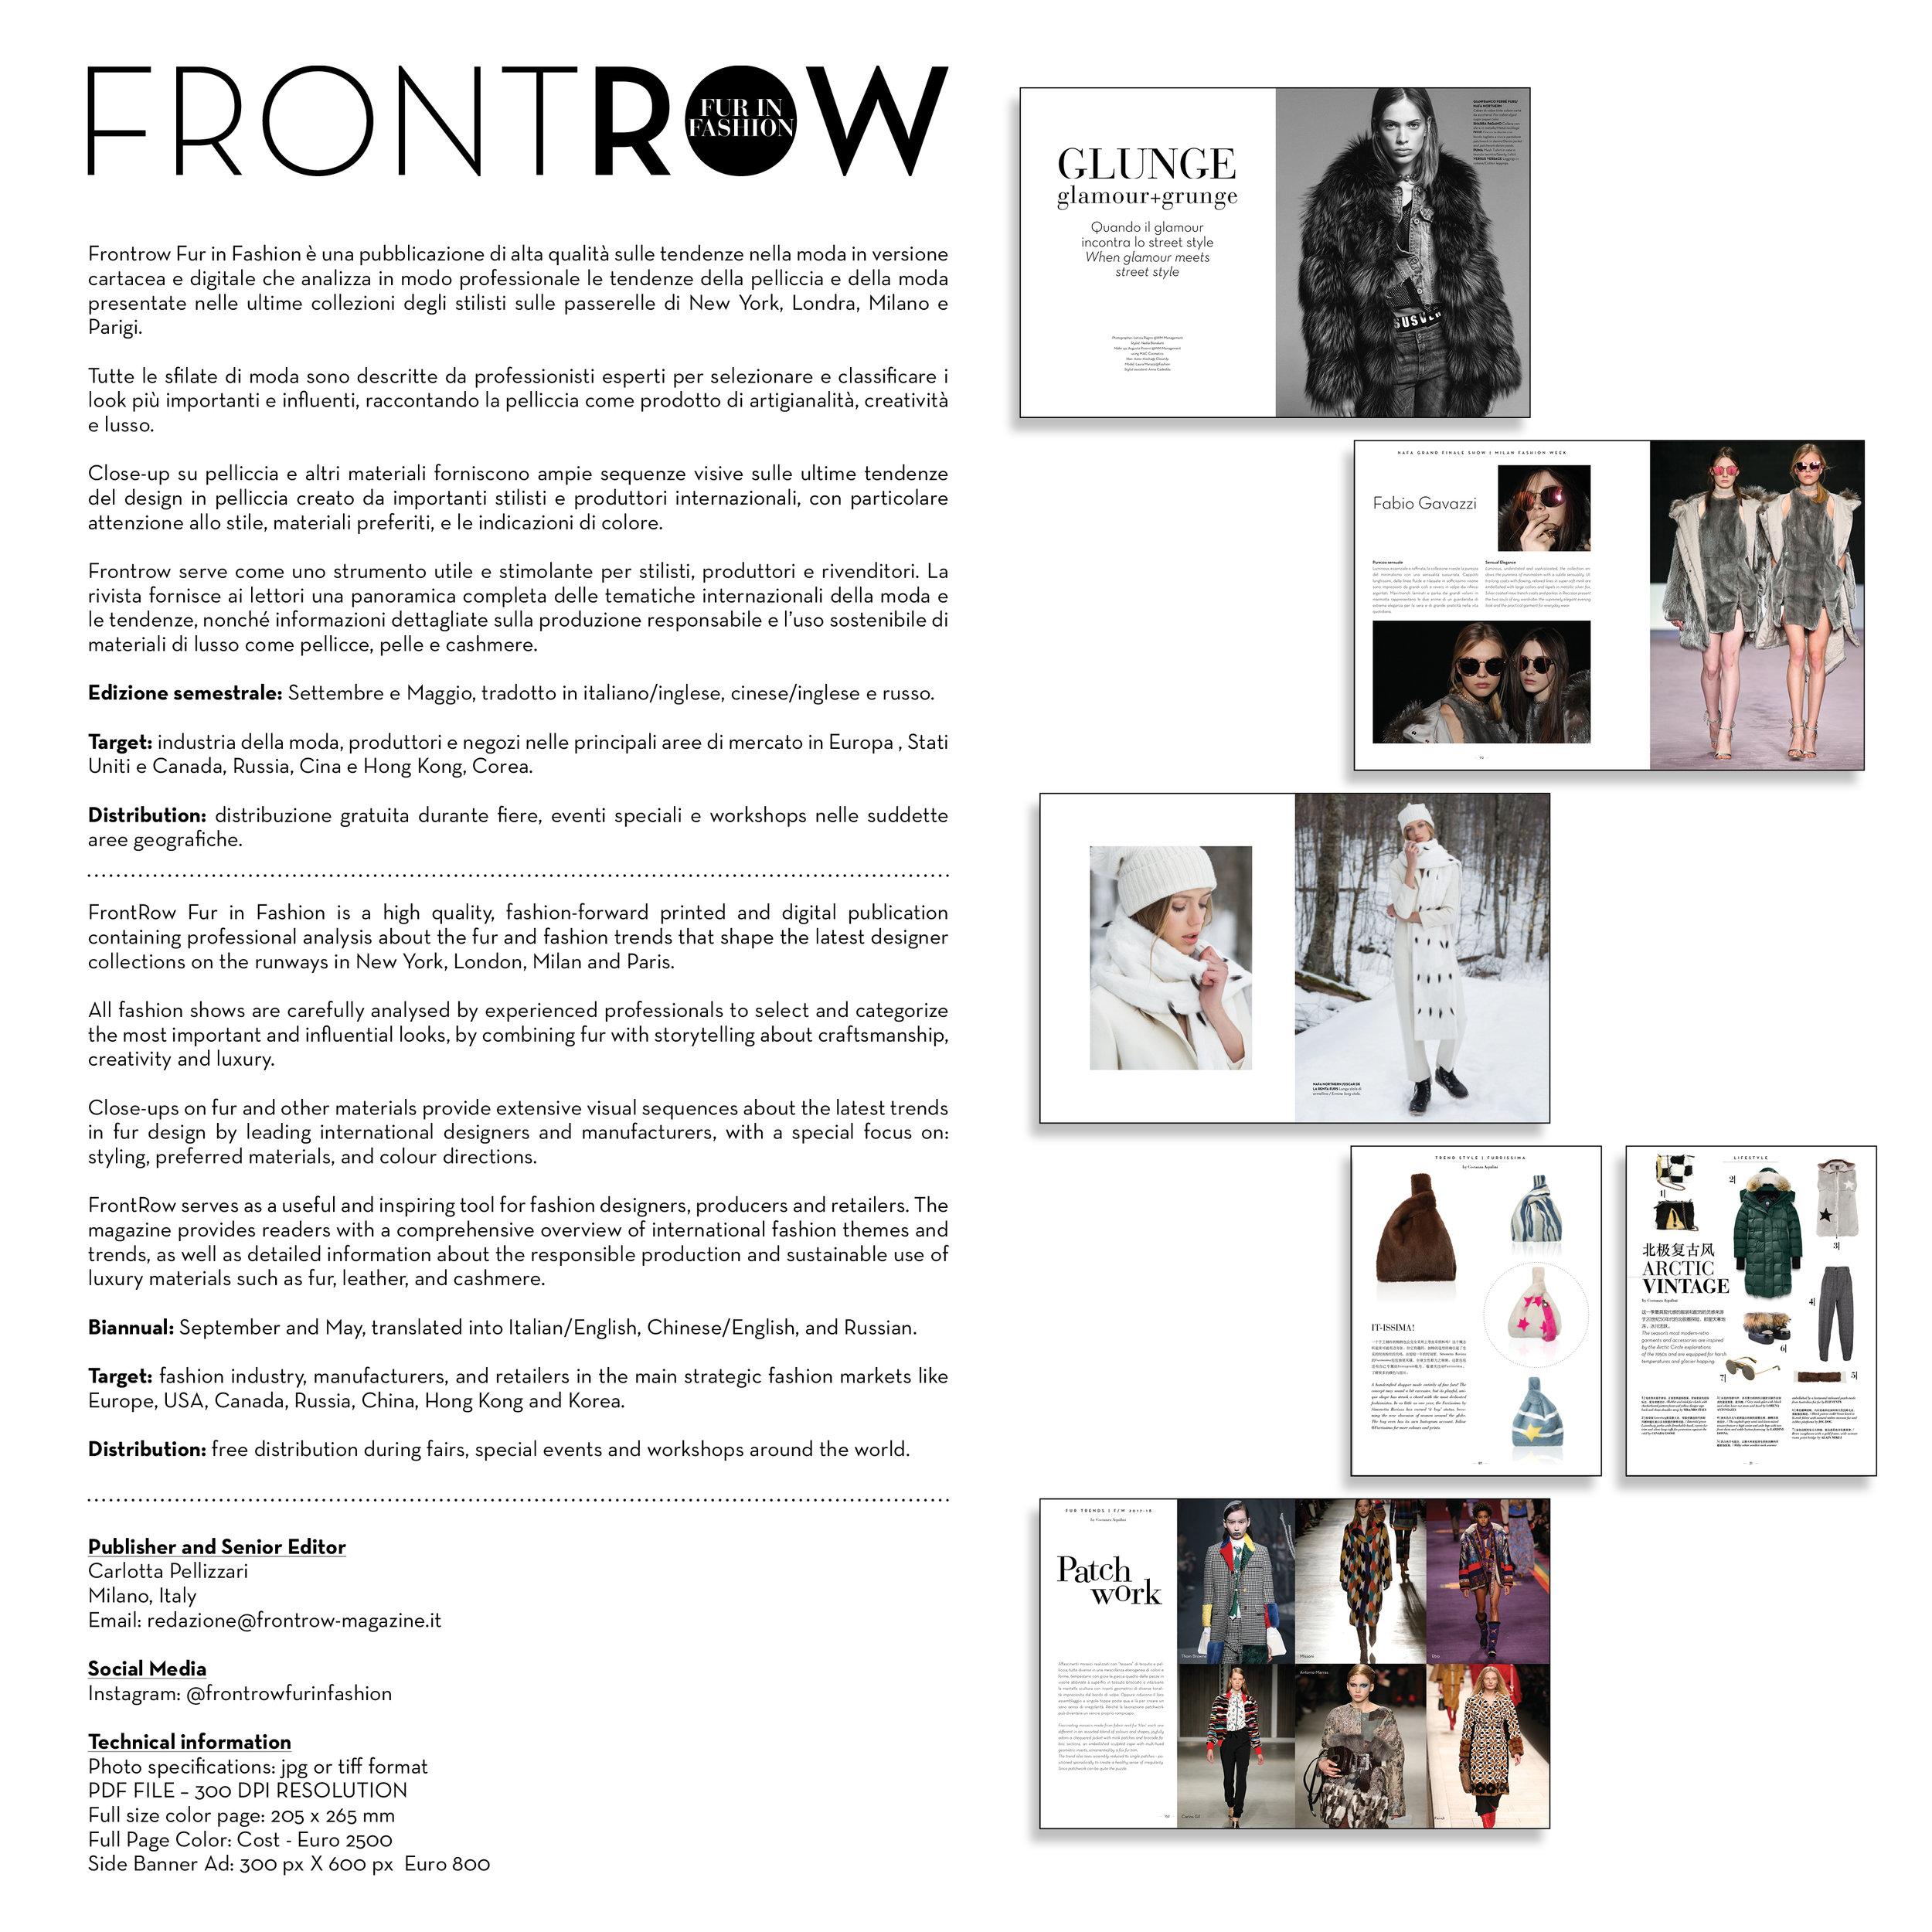 Frontrow-Media-Kit-2.jpg